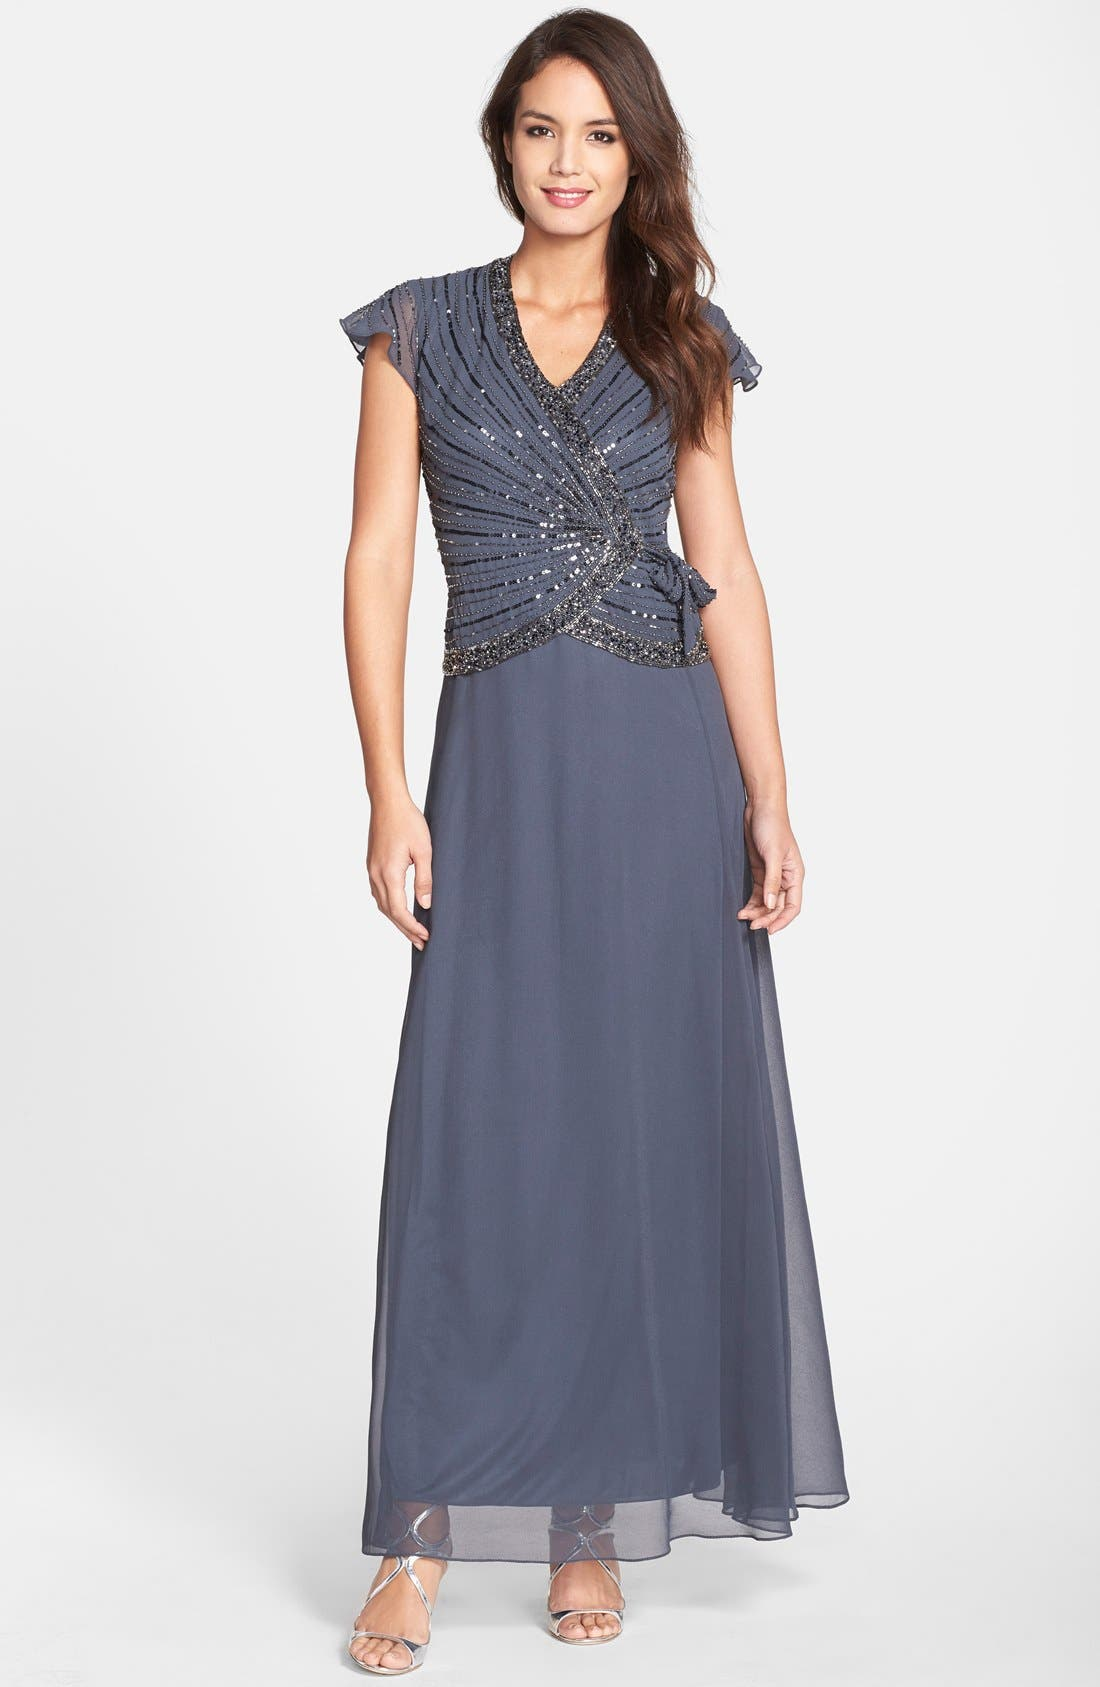 Alternate Image 1 Selected - J Kara Embellished Mock Two-Piece Gown